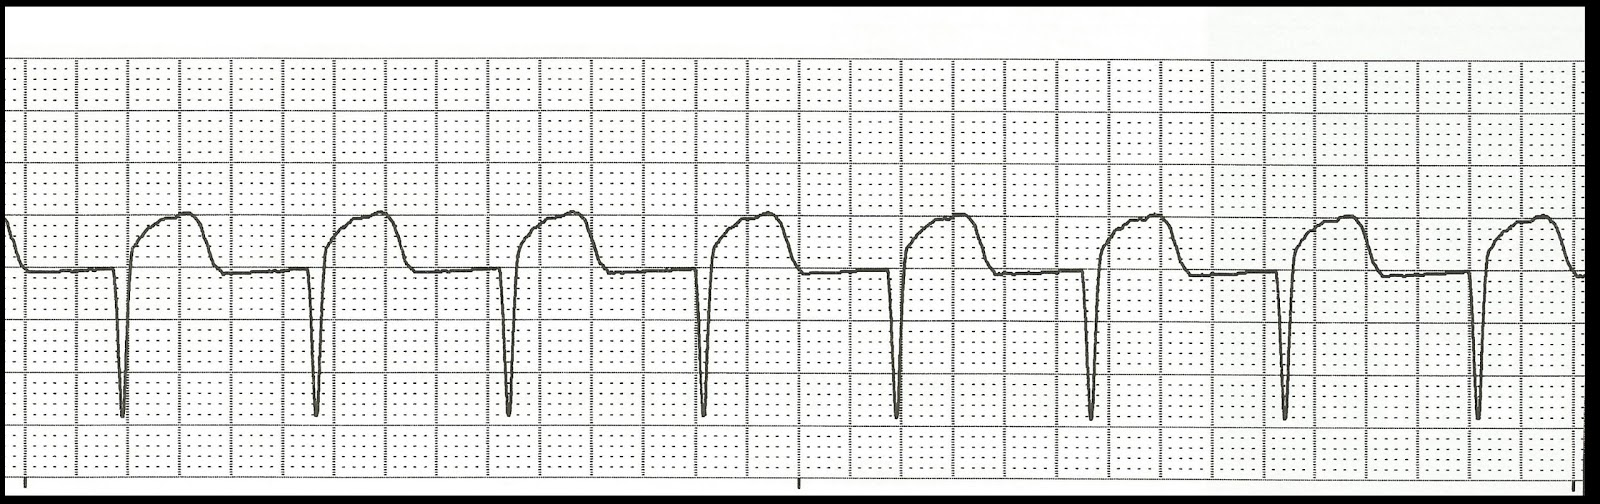 Accelerated junctional rhythm jpgAccelerated Junctional Rhythm